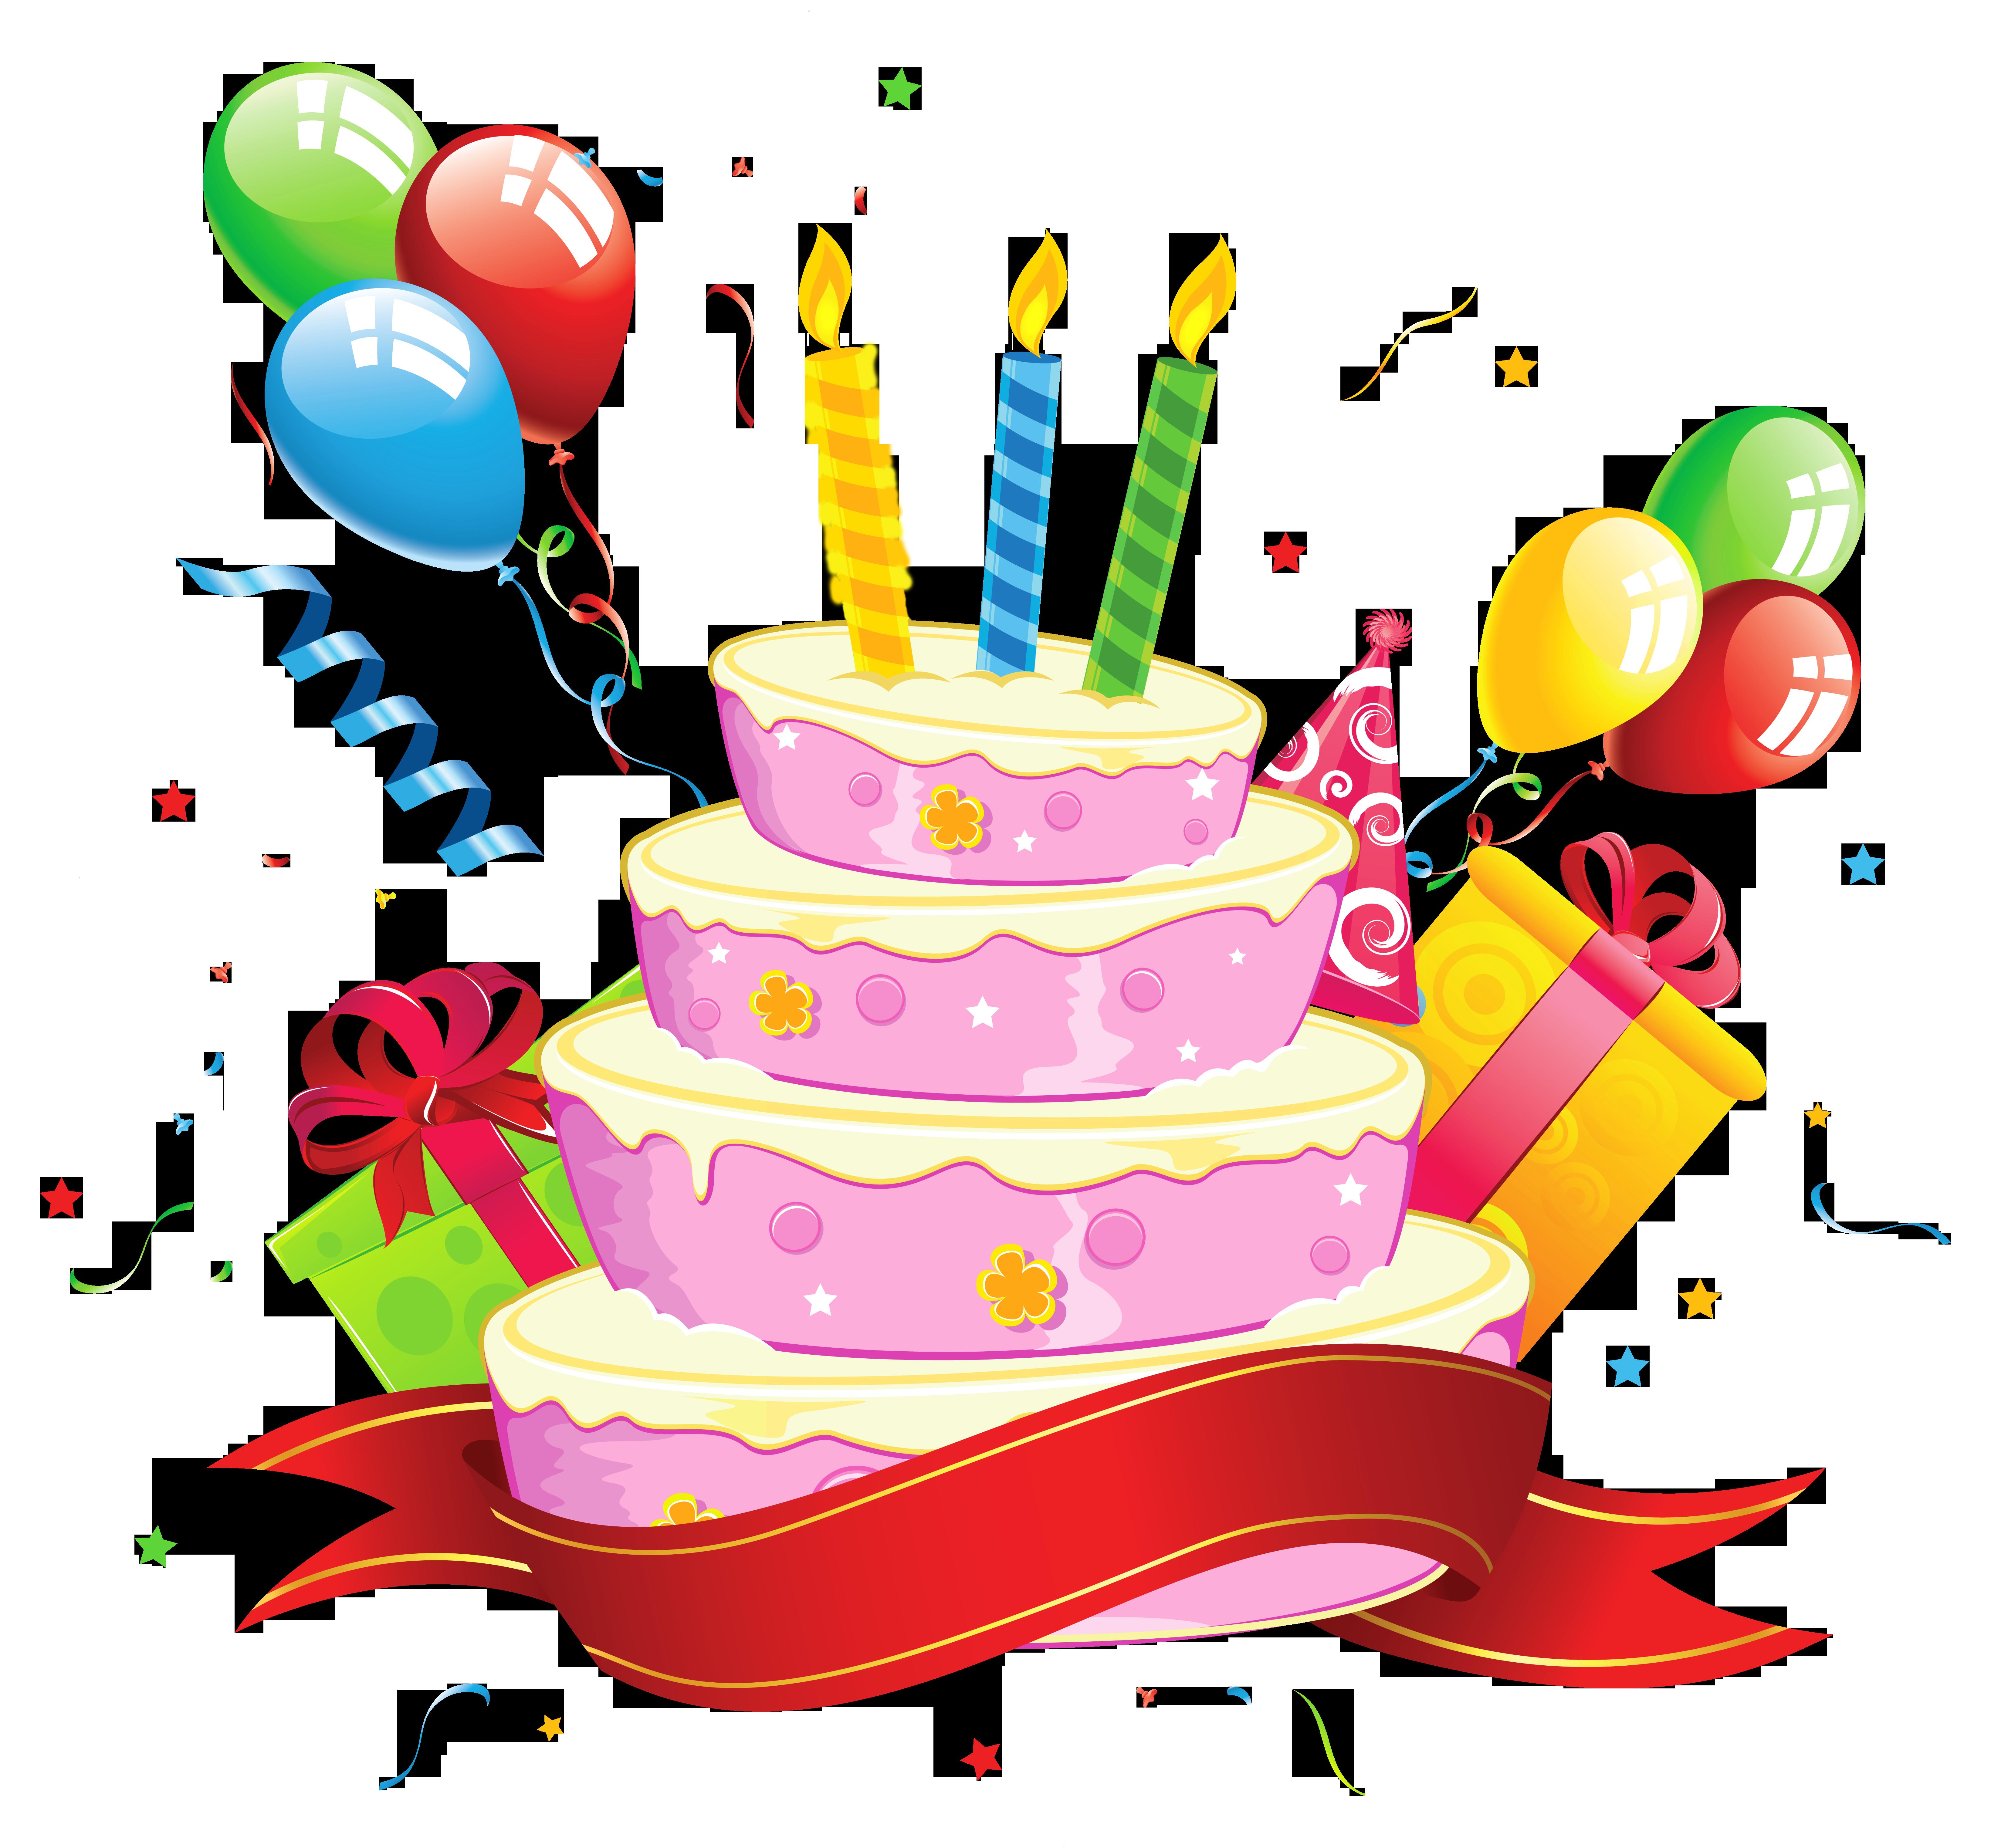 Cake gallery yopriceville high. Clipart birthday transparent background